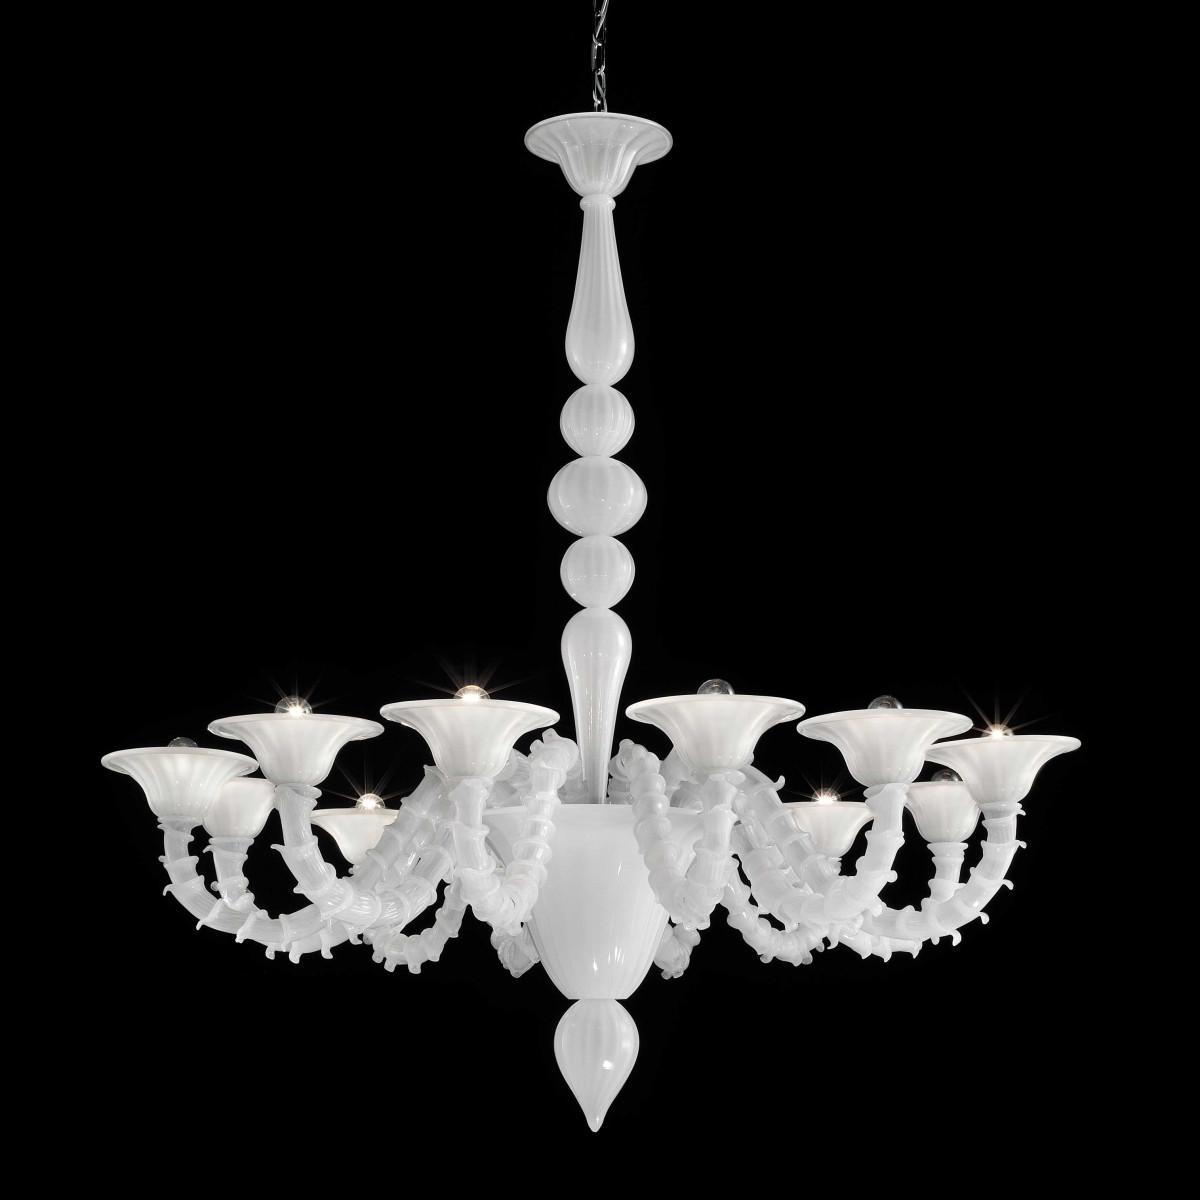 """Candido"" lustre en cristal de Murano - 6 lumieres - blanc"